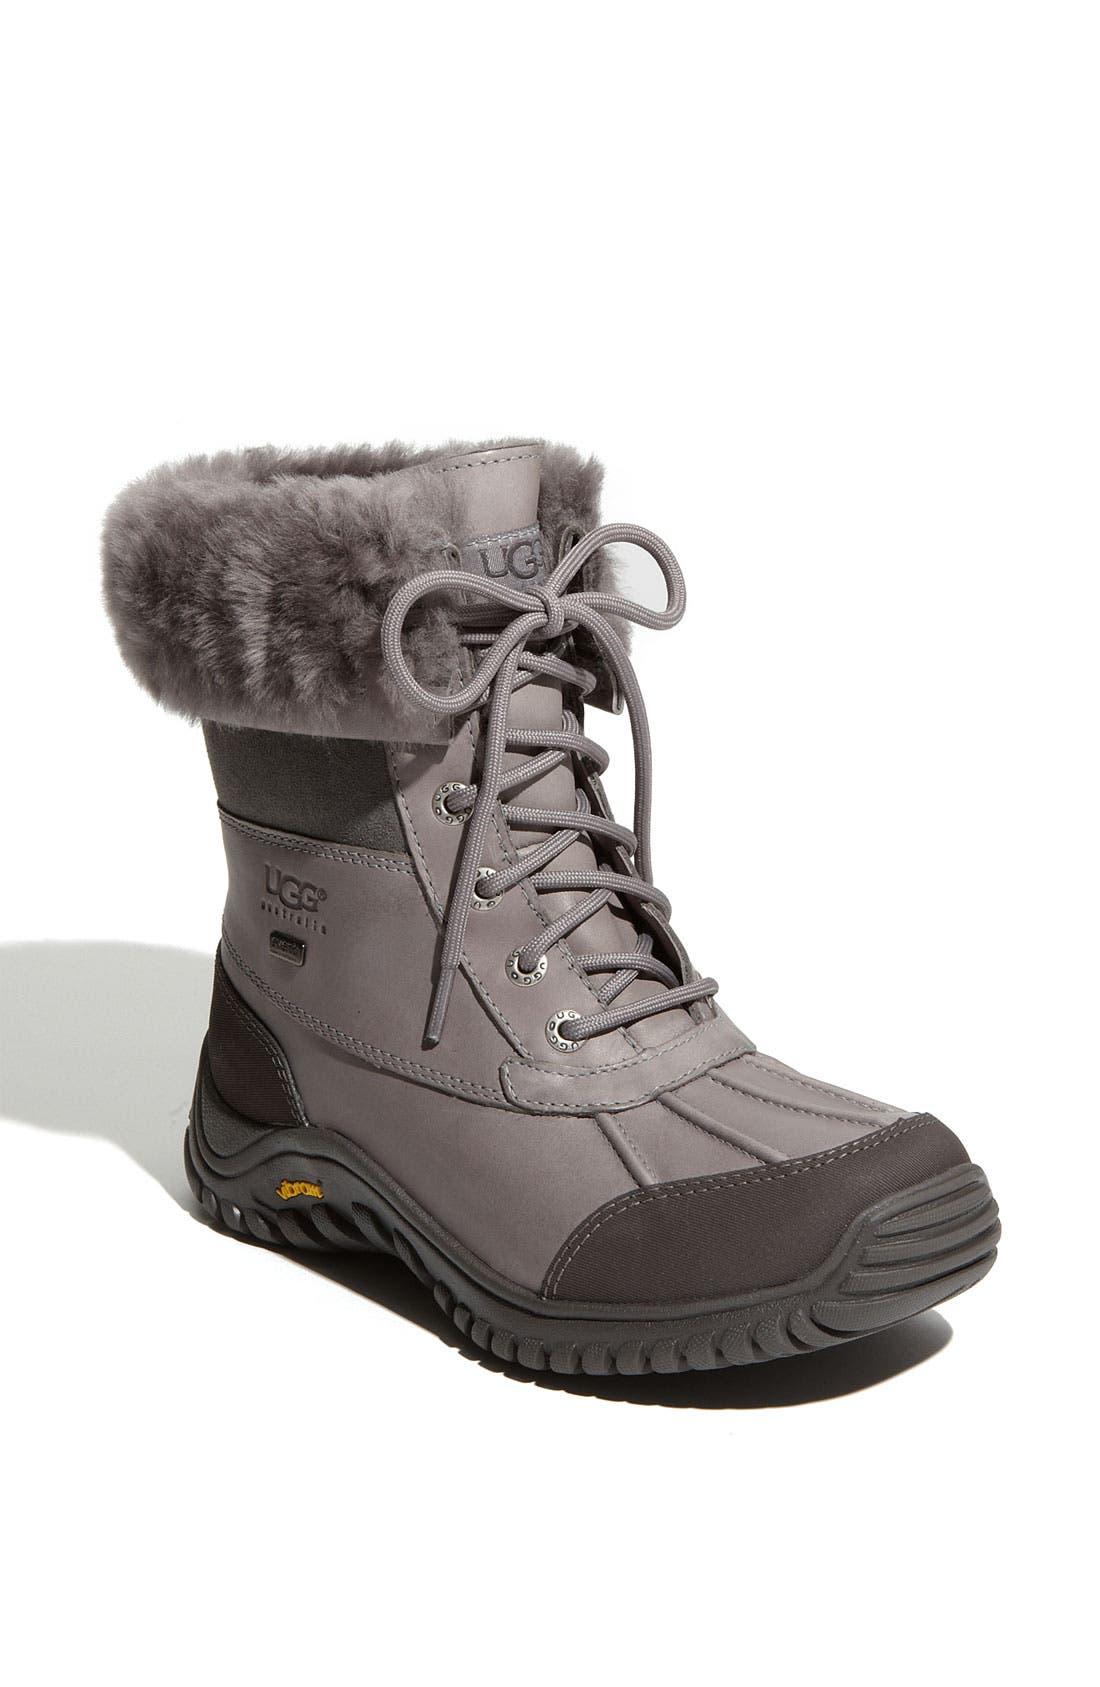 Adirondack II Waterproof Boot,                             Main thumbnail 1, color,                             Grey